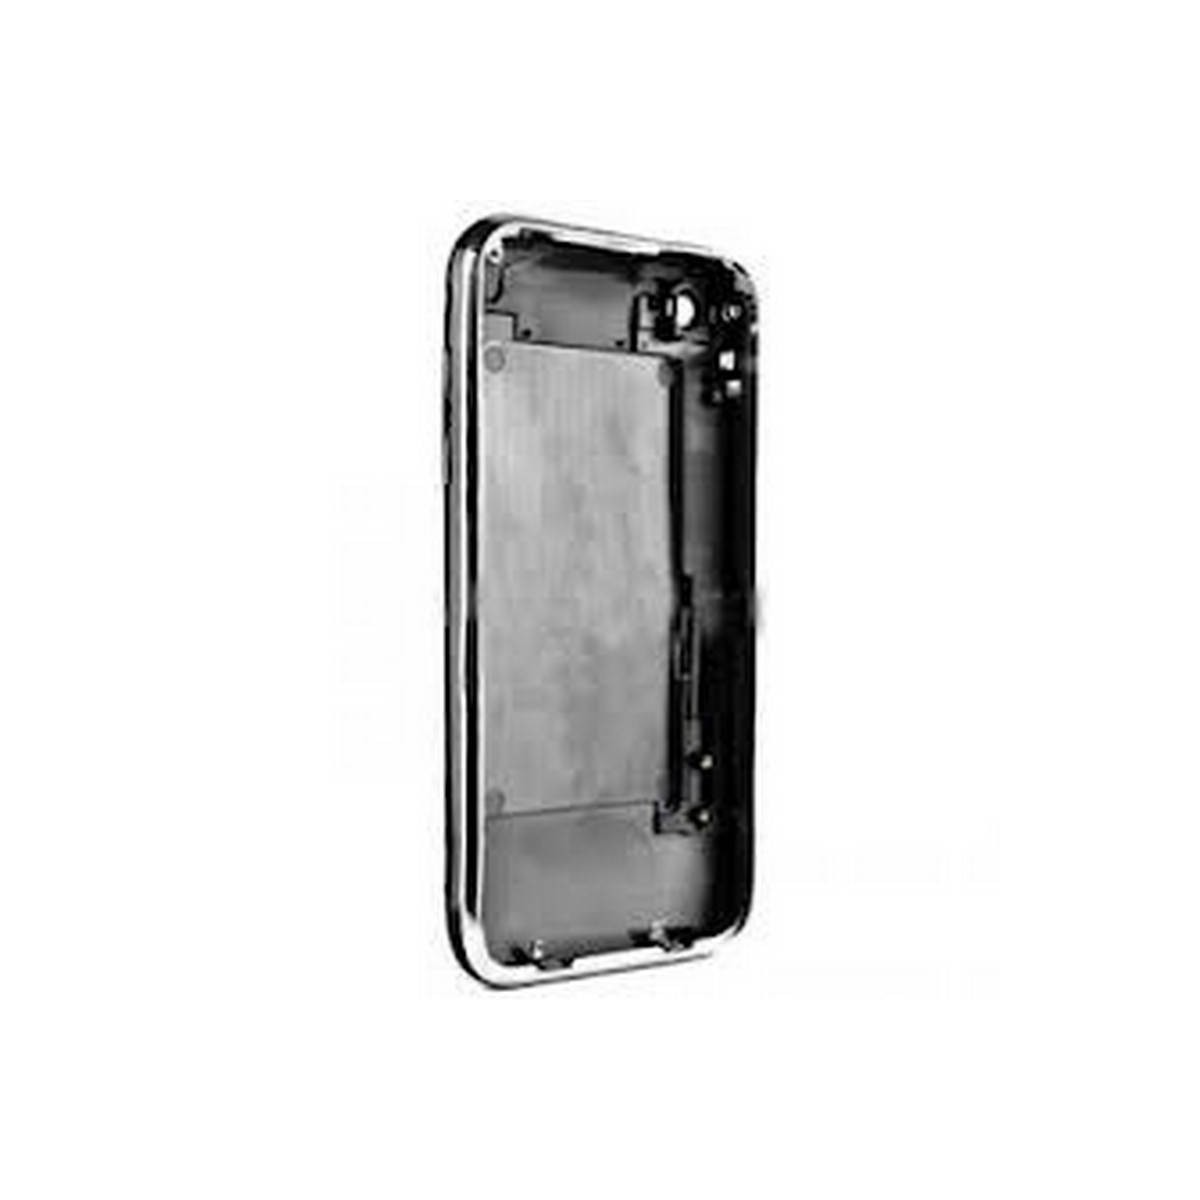 Tapa con marco iphone 3G Negra 8GB